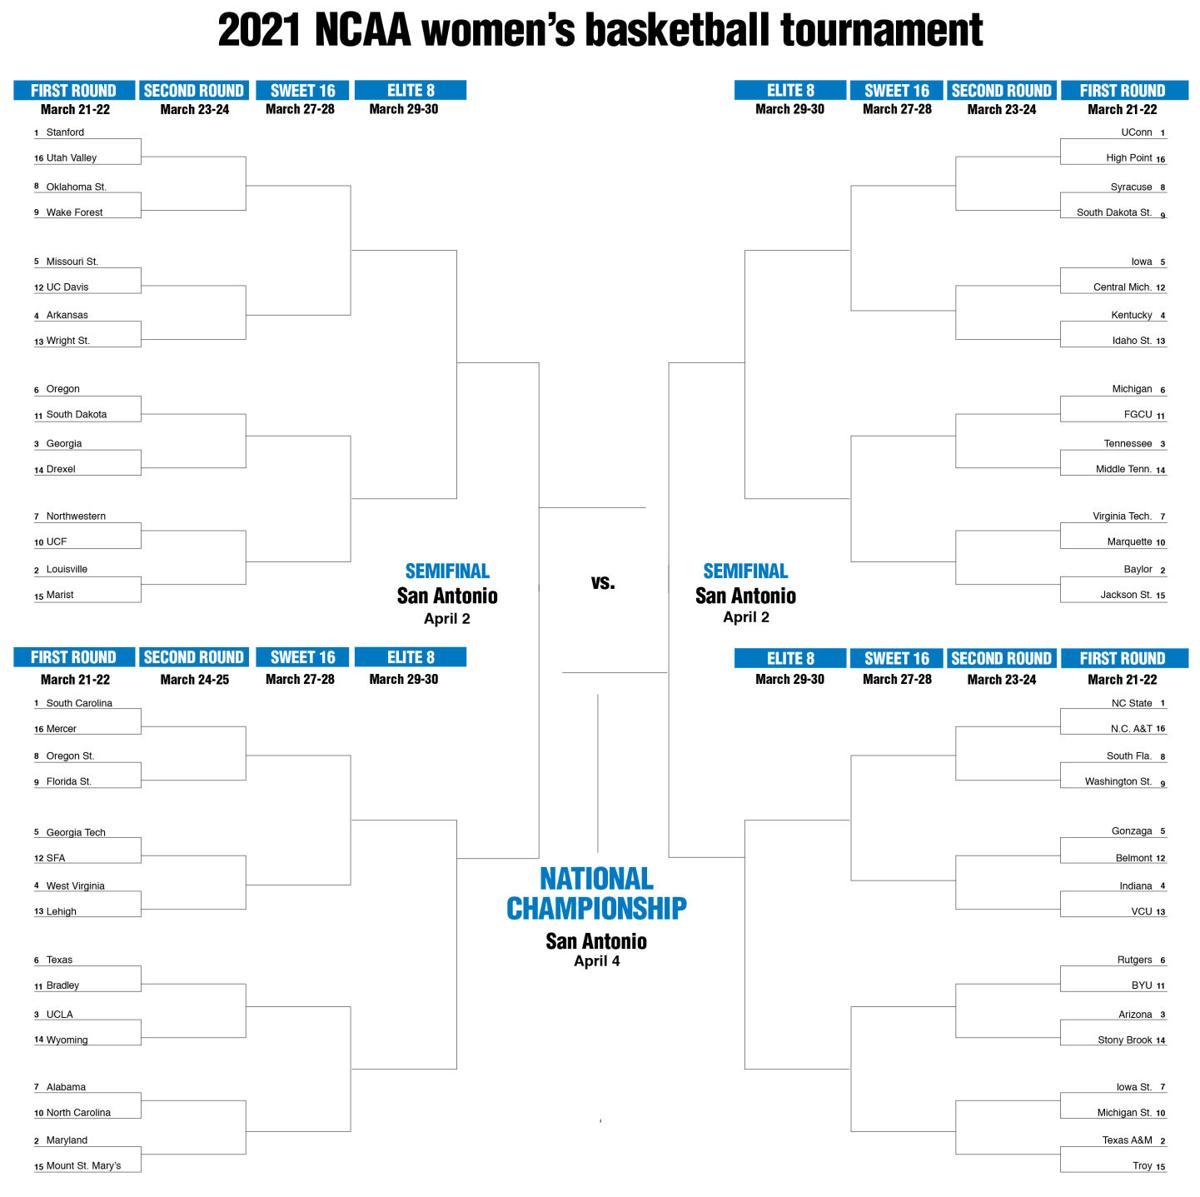 2021 full NCAA Women's basketball tournament bracket